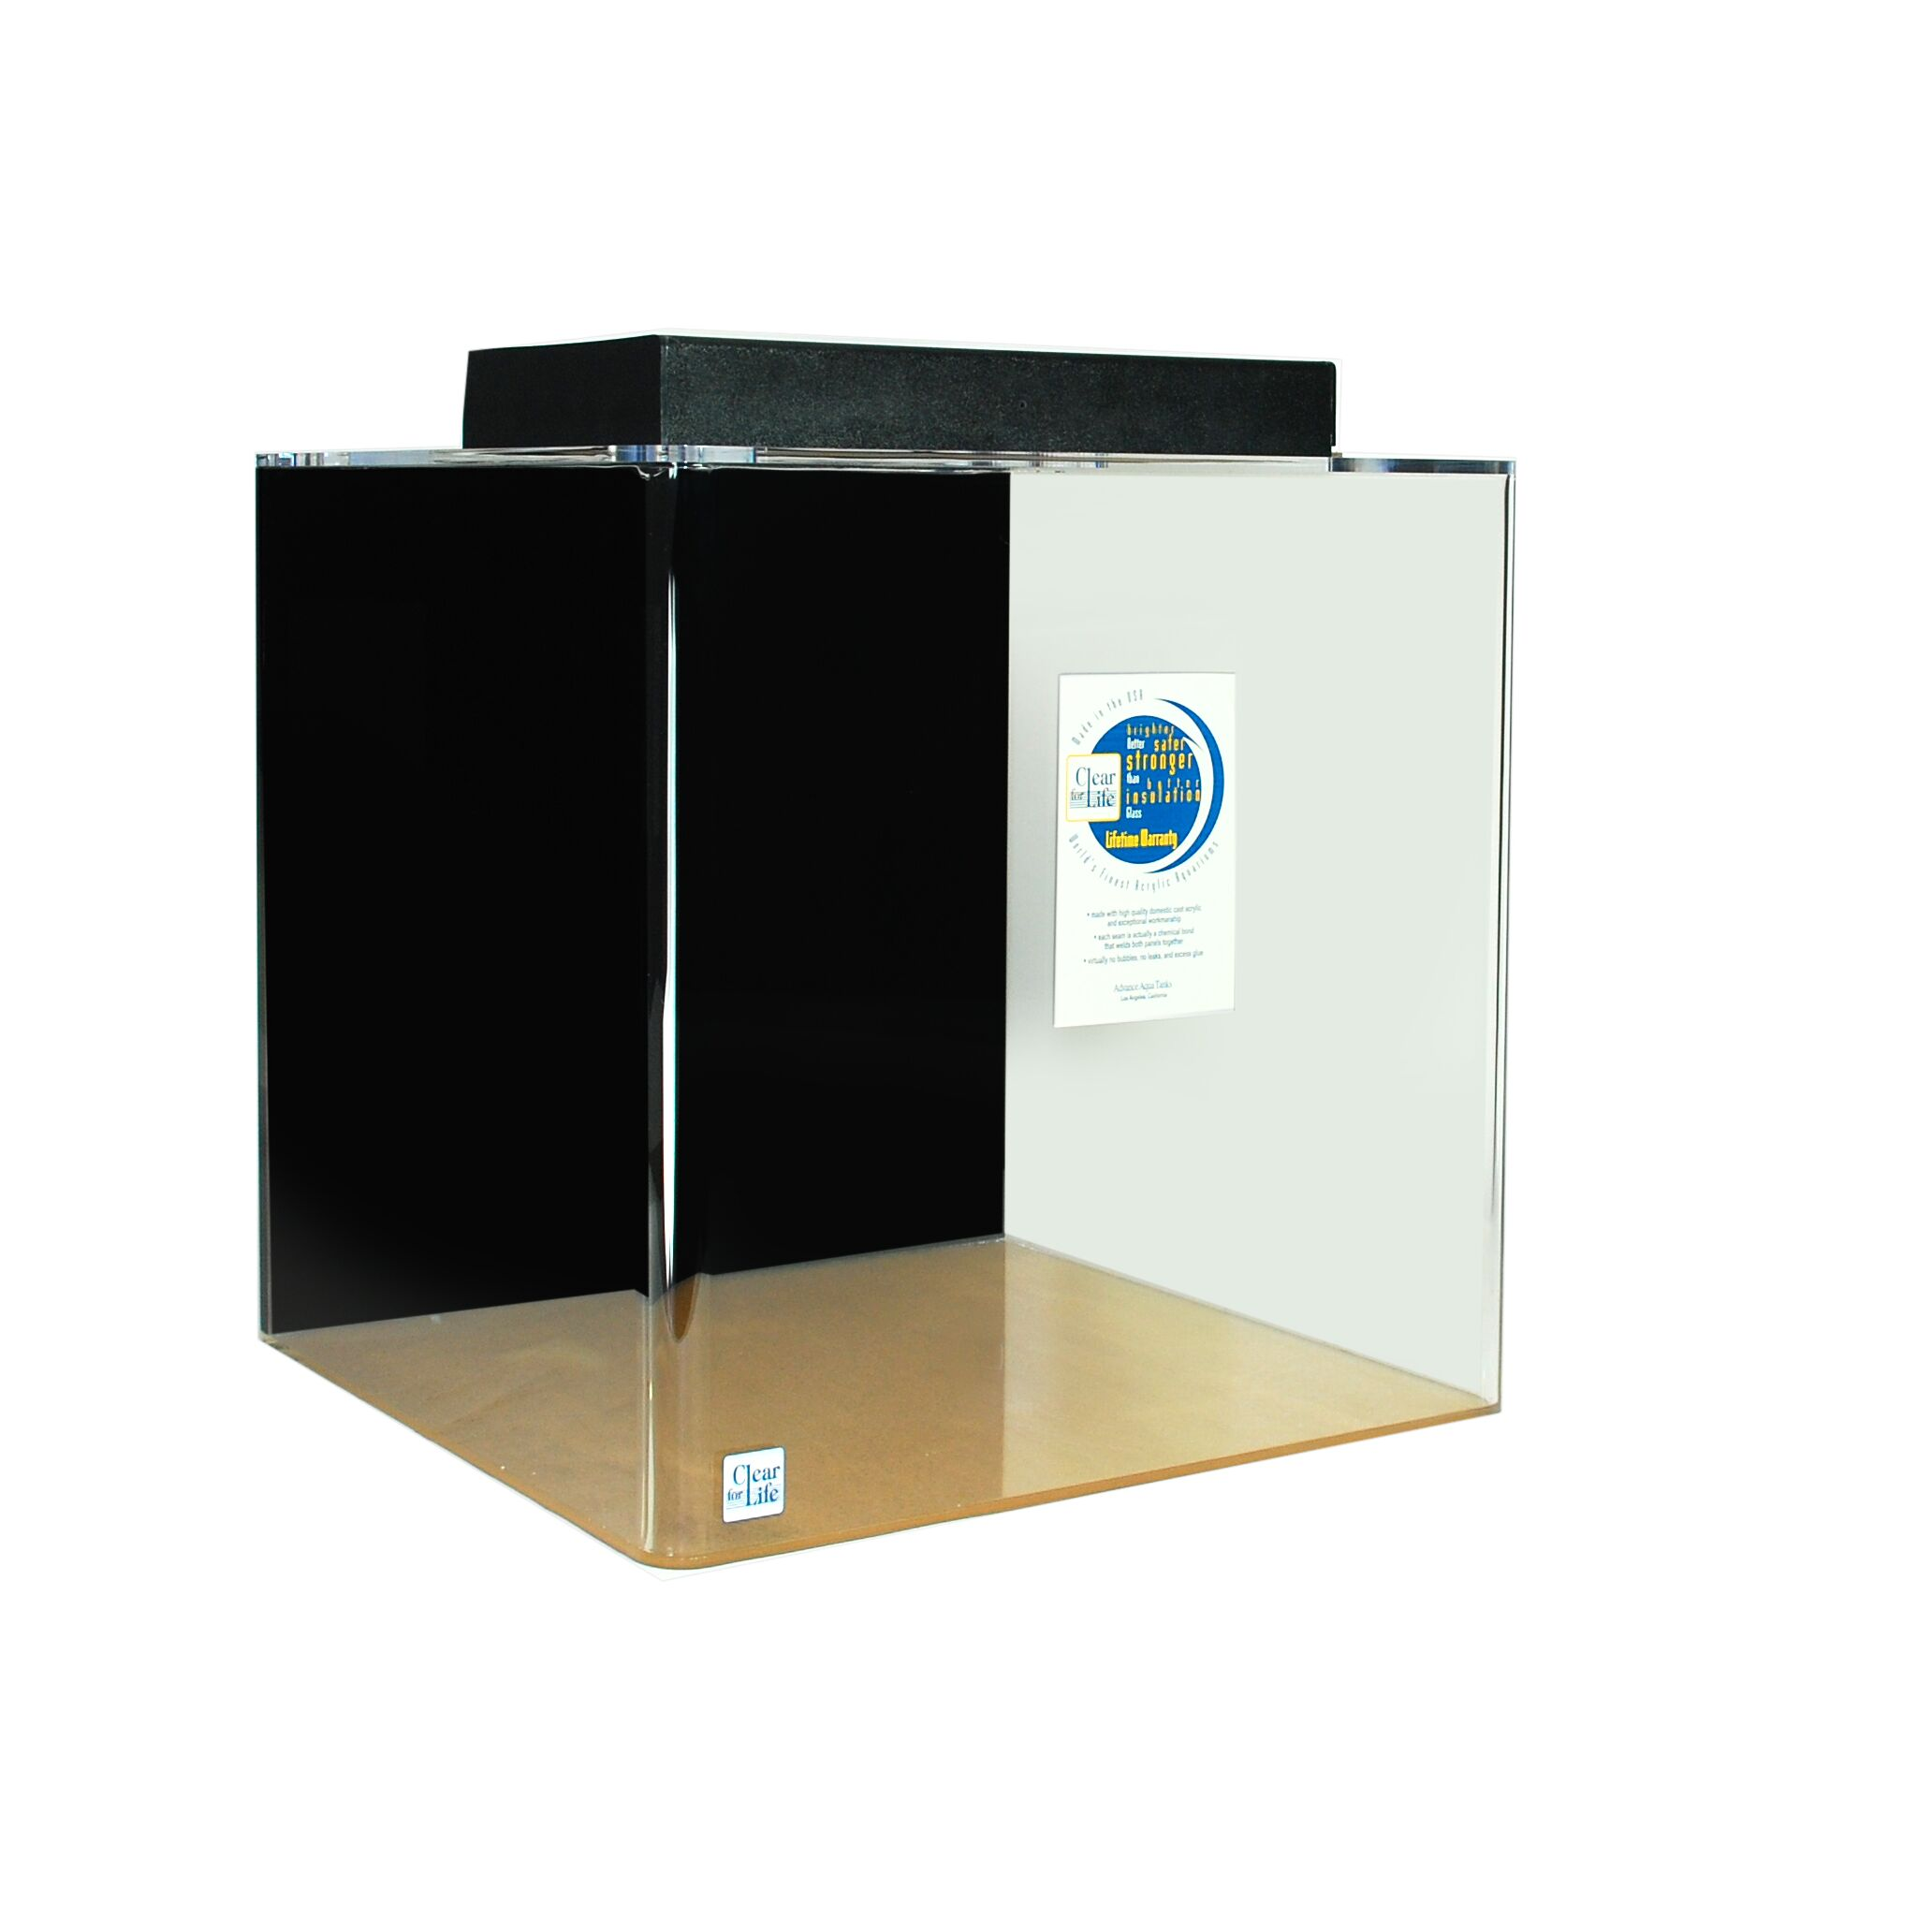 Mullen Cube Acrylic Aquarium Tank Color: Black, Size: 24